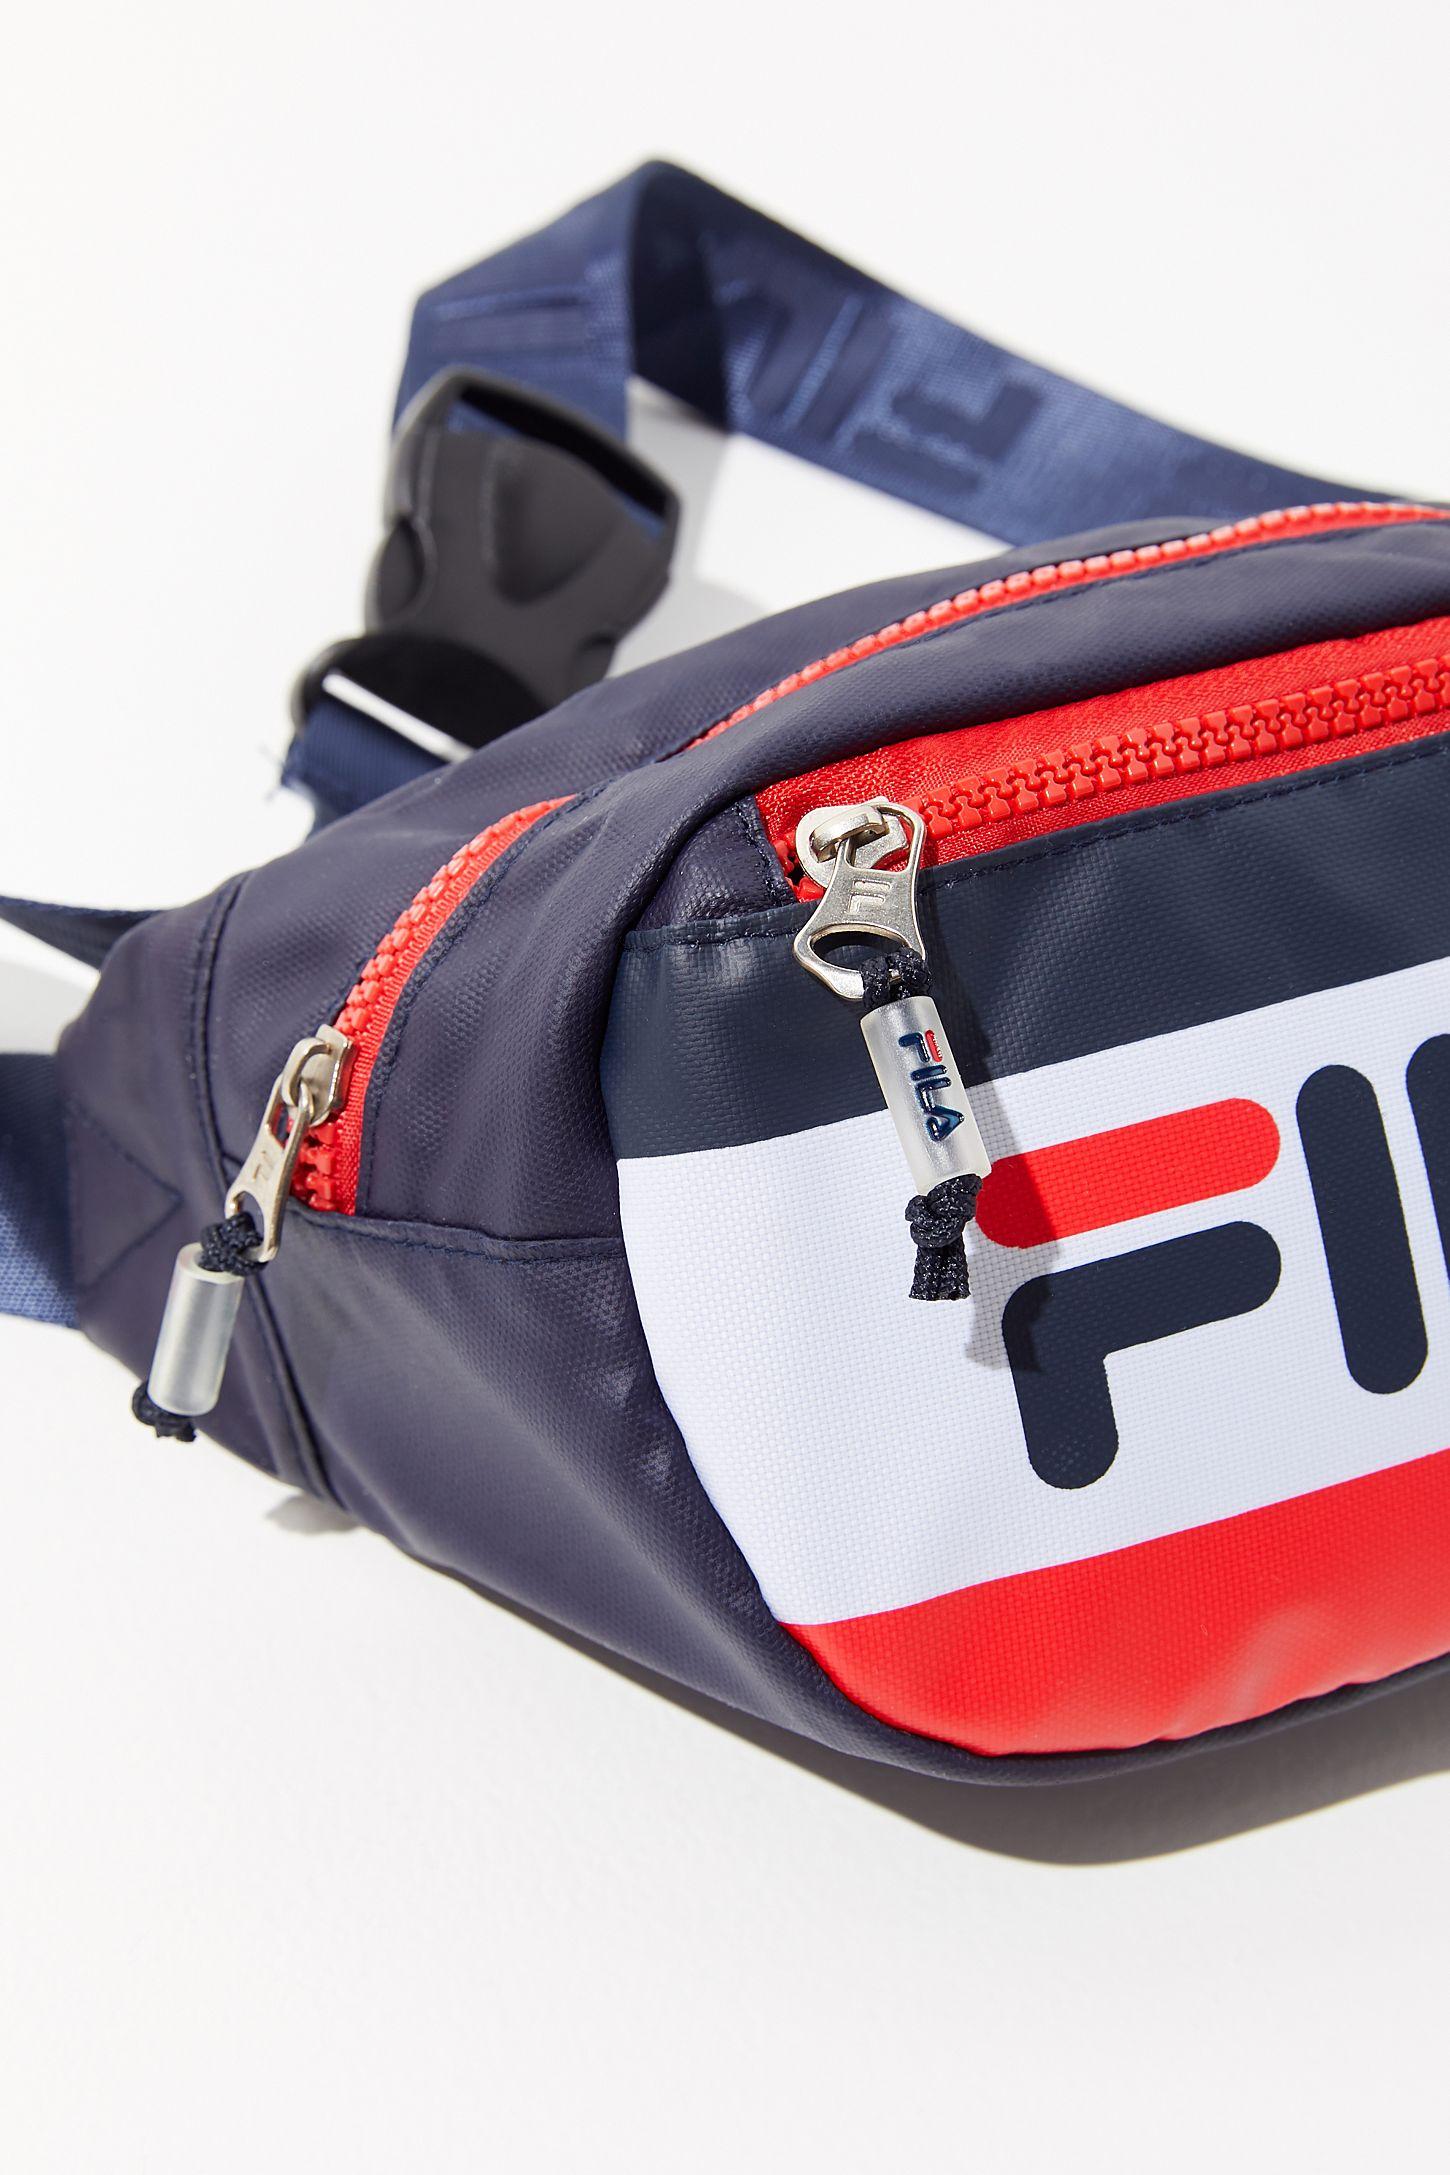 Fila Hunts Belt Bag Urban Outfitters Ready Stock Waist Zipper On Slide View 5